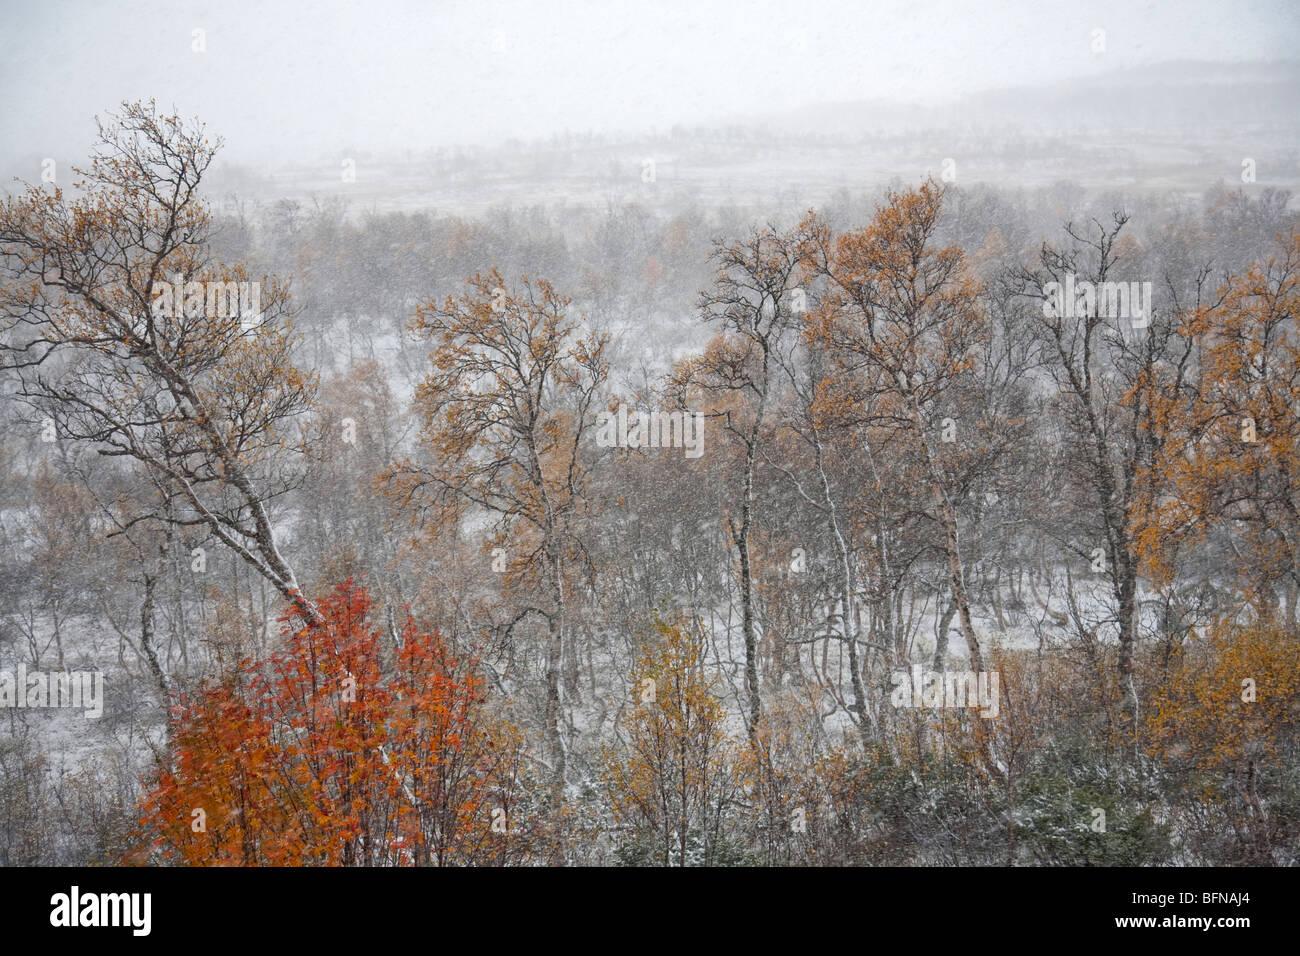 first snow snowfall snow storm winter mood atmospheric iconic Sweden Jämtland Storulvån - Stock Image